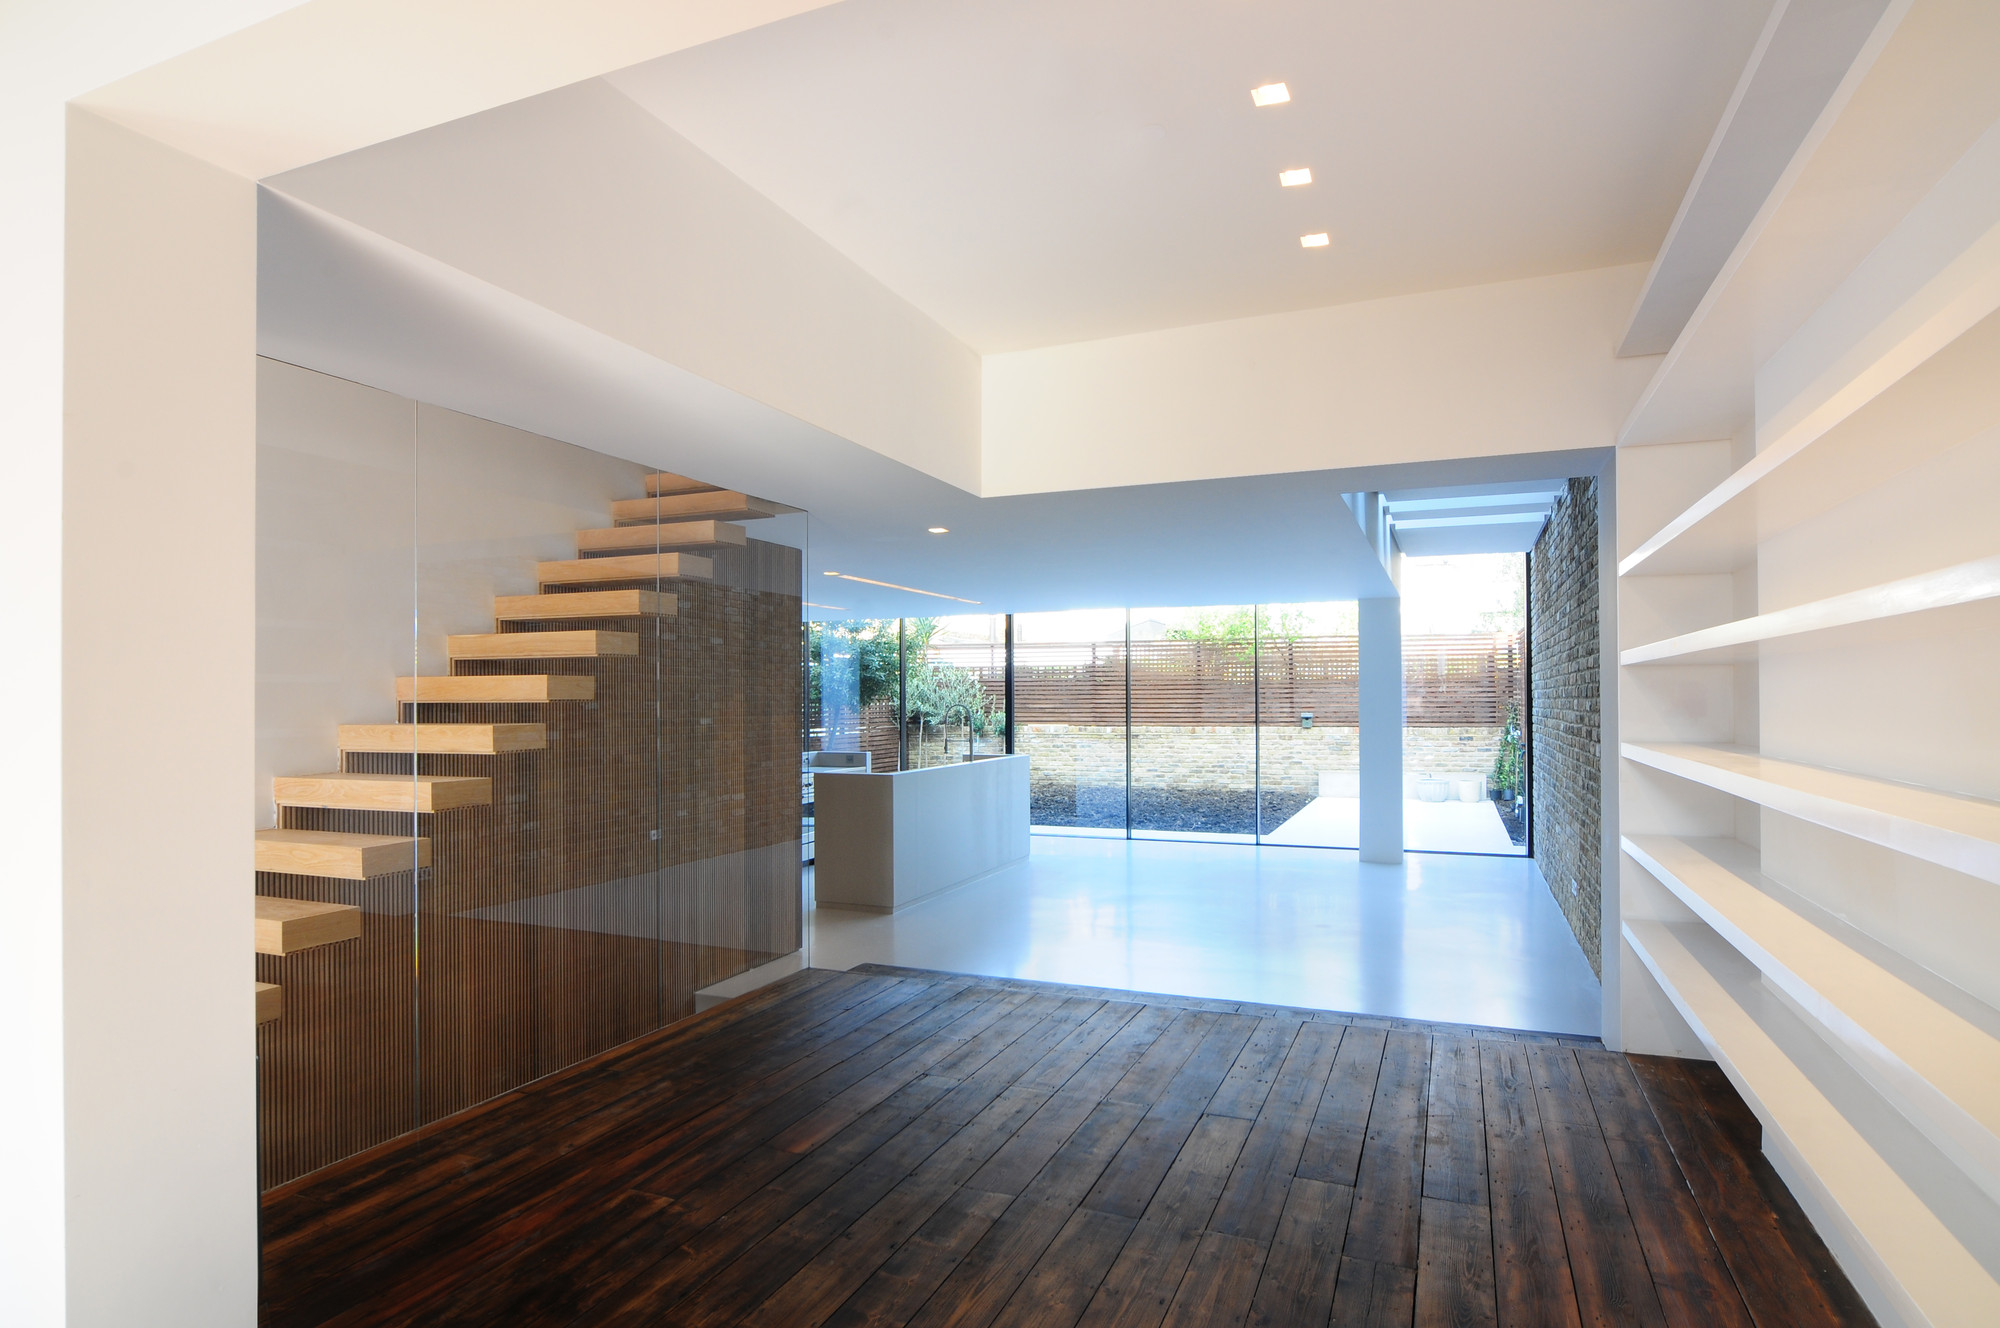 HomeMade / Bureau de Change Design Office